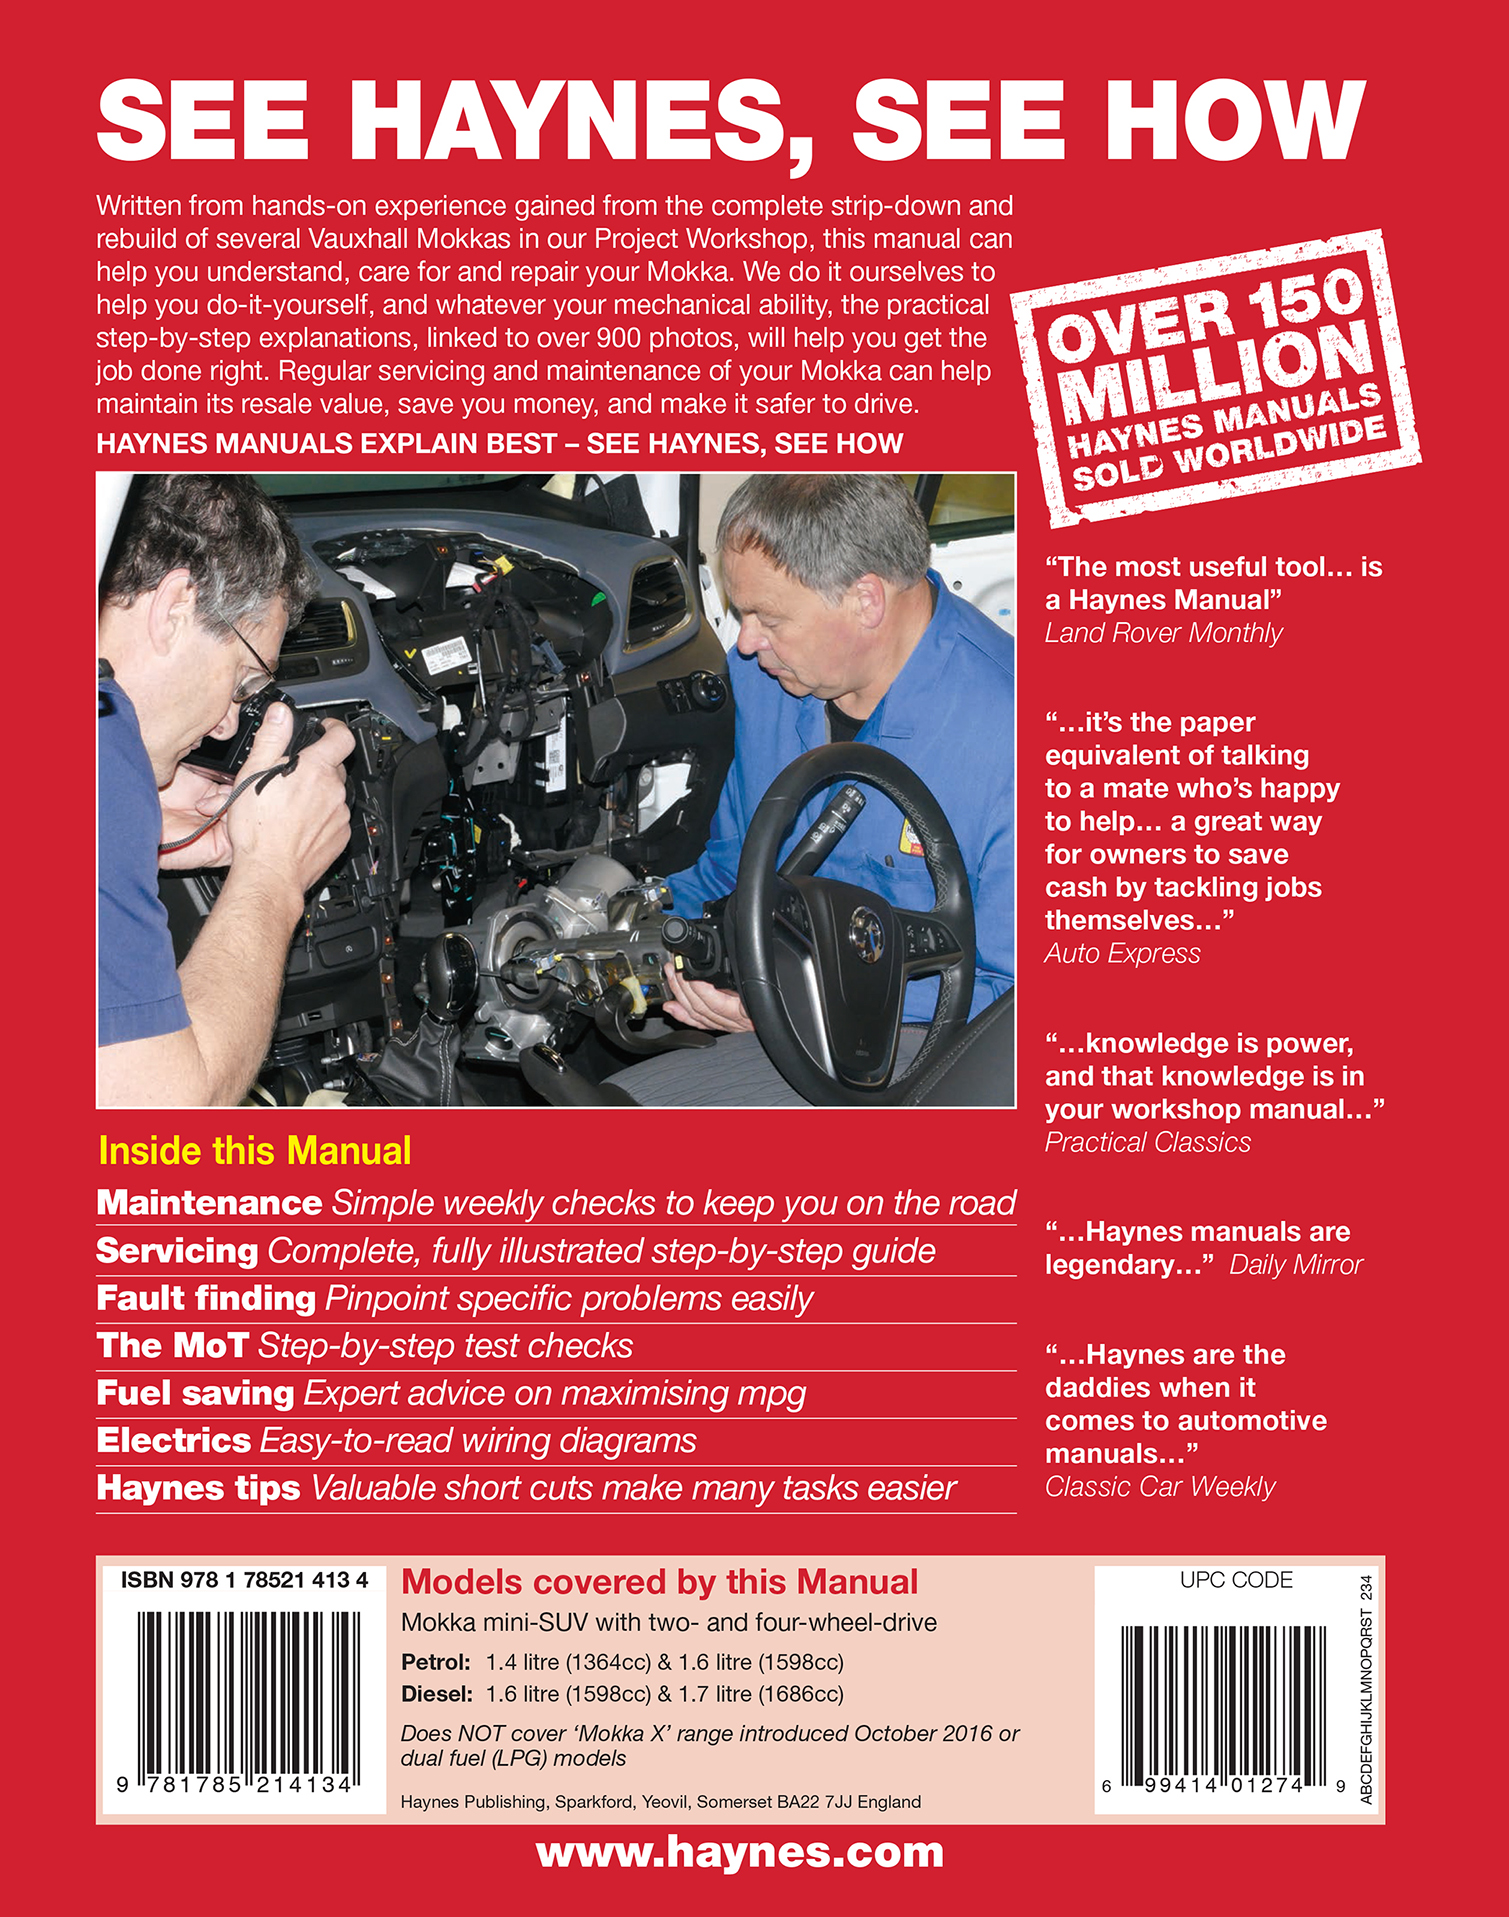 Manual Of The Shanklin Heat Sealer S26 Ebook Yale Glp060 Wiring Diagram Array Rh